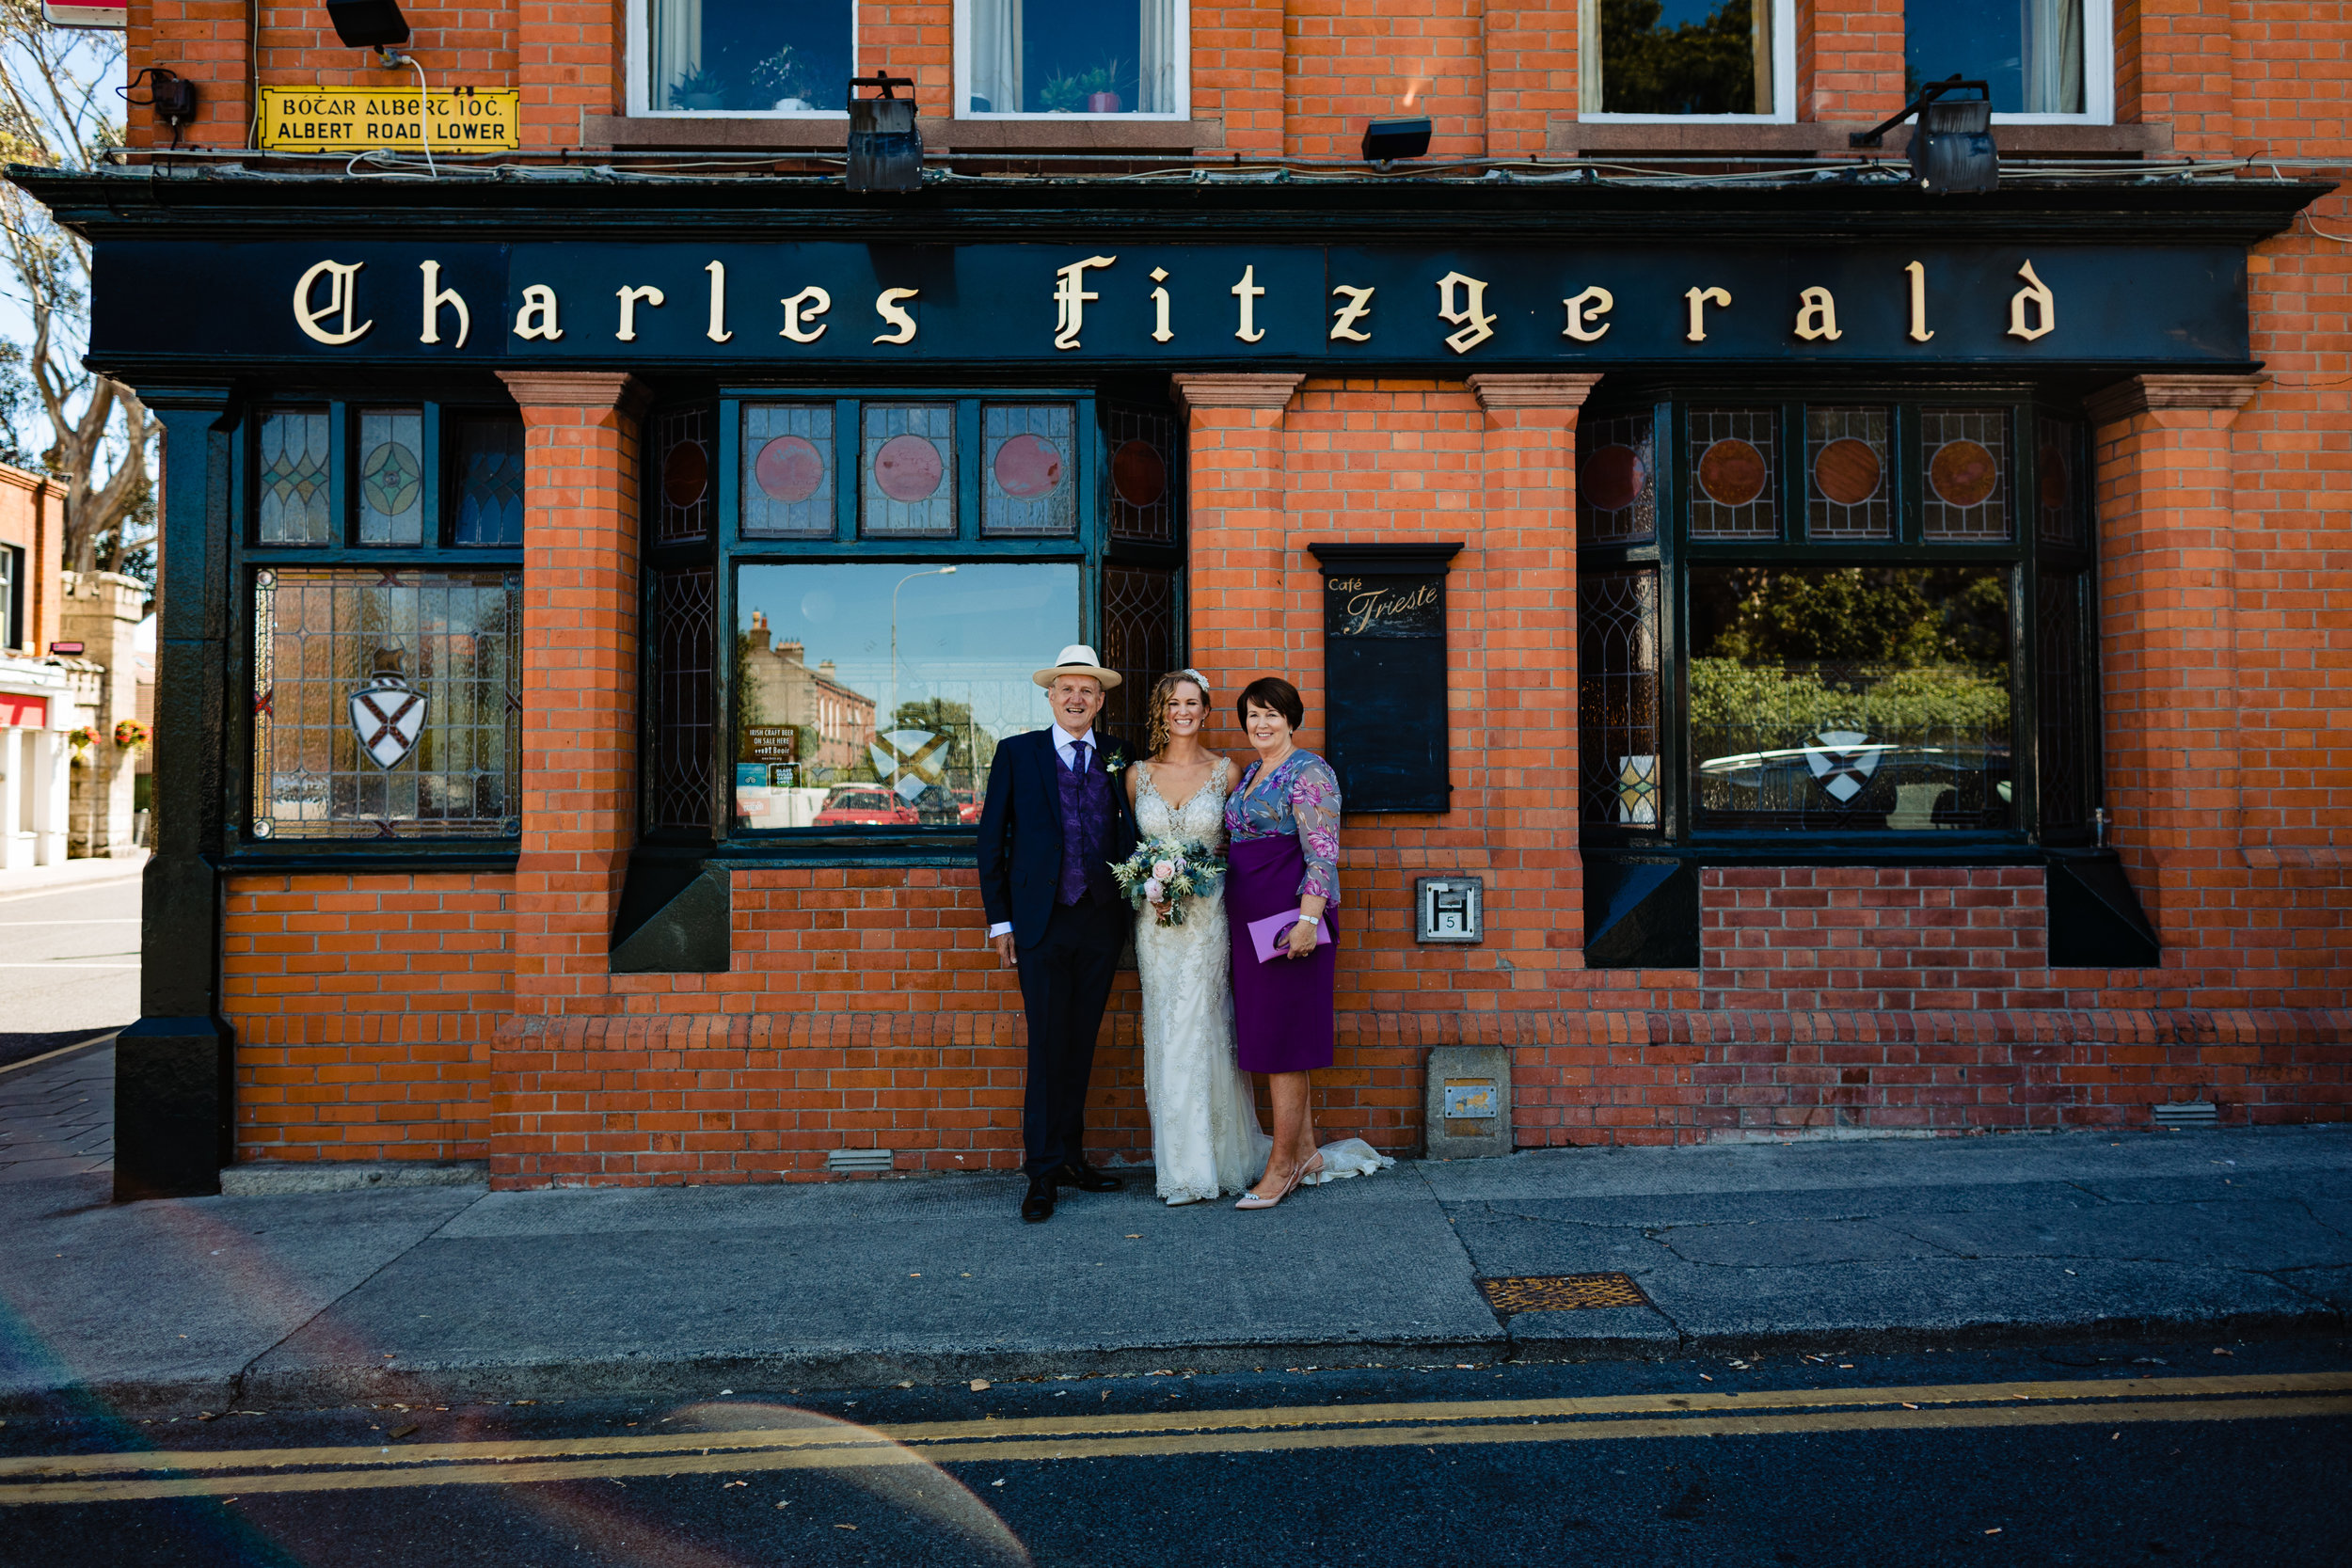 Fitzgeralds Pub Sandycove